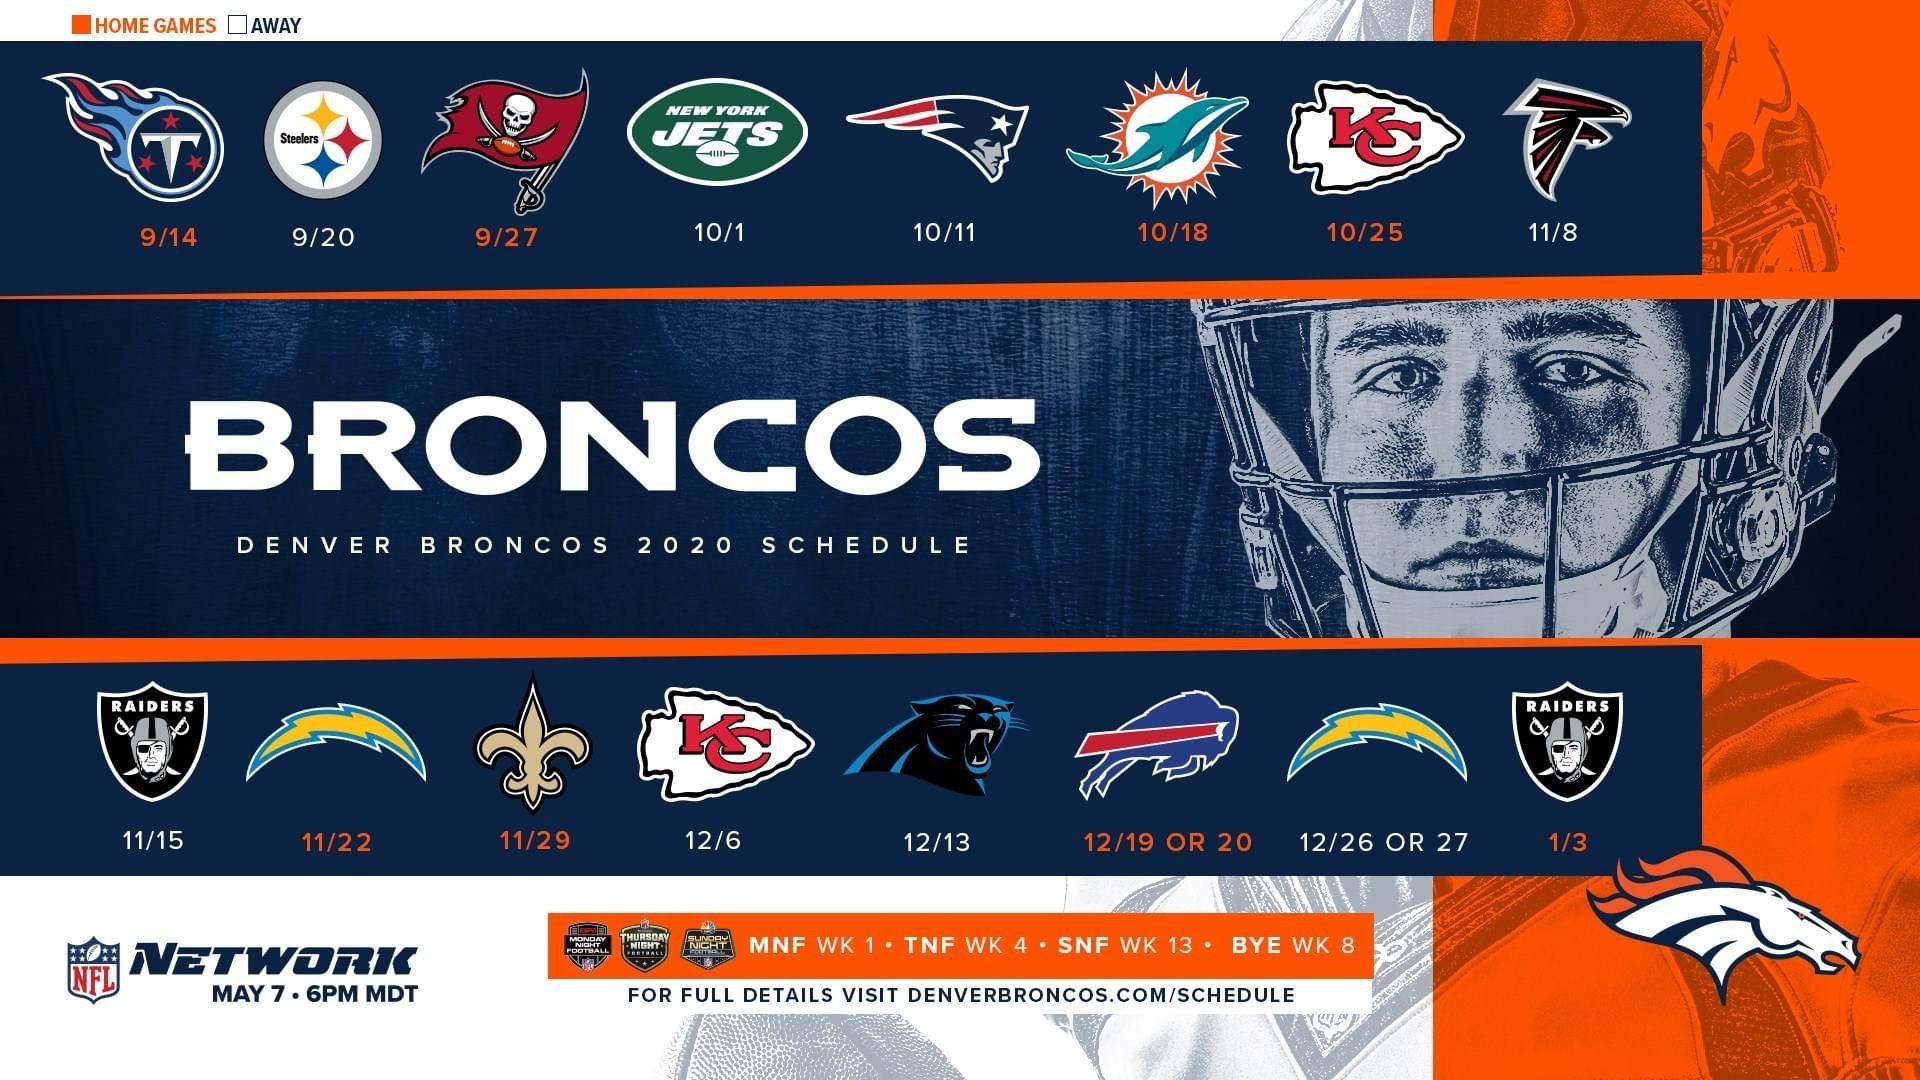 2020-2021 Season | Printable Nfl Schedule, Broncos, Denver